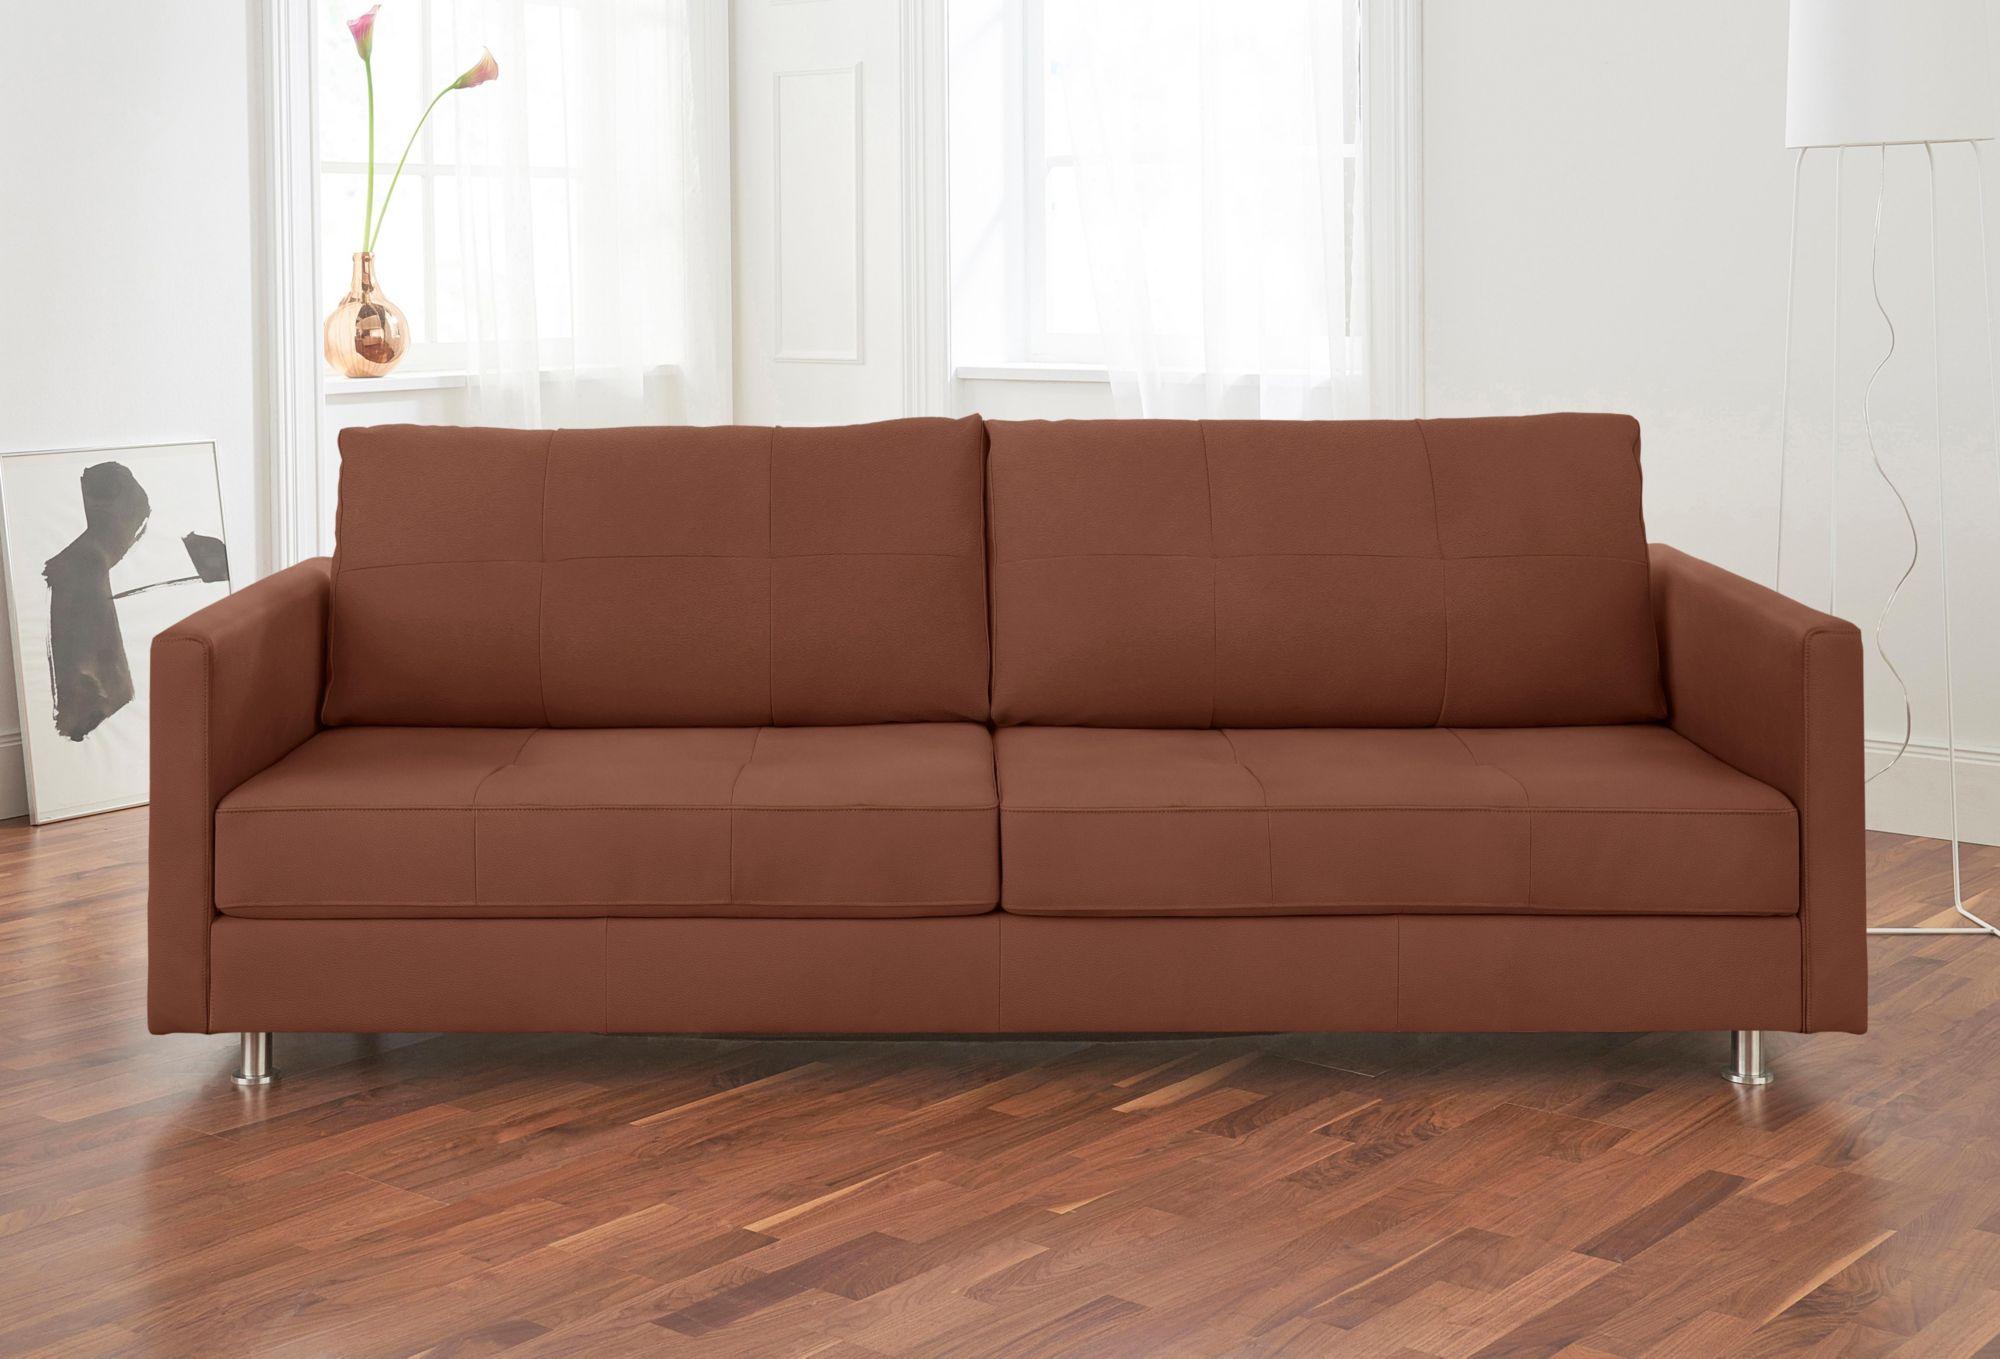 ALTE GERBEREI Alte Gerberei 3-Sitzer Sofa »Vincent« mit Steppung, inklusive Rückenkissen